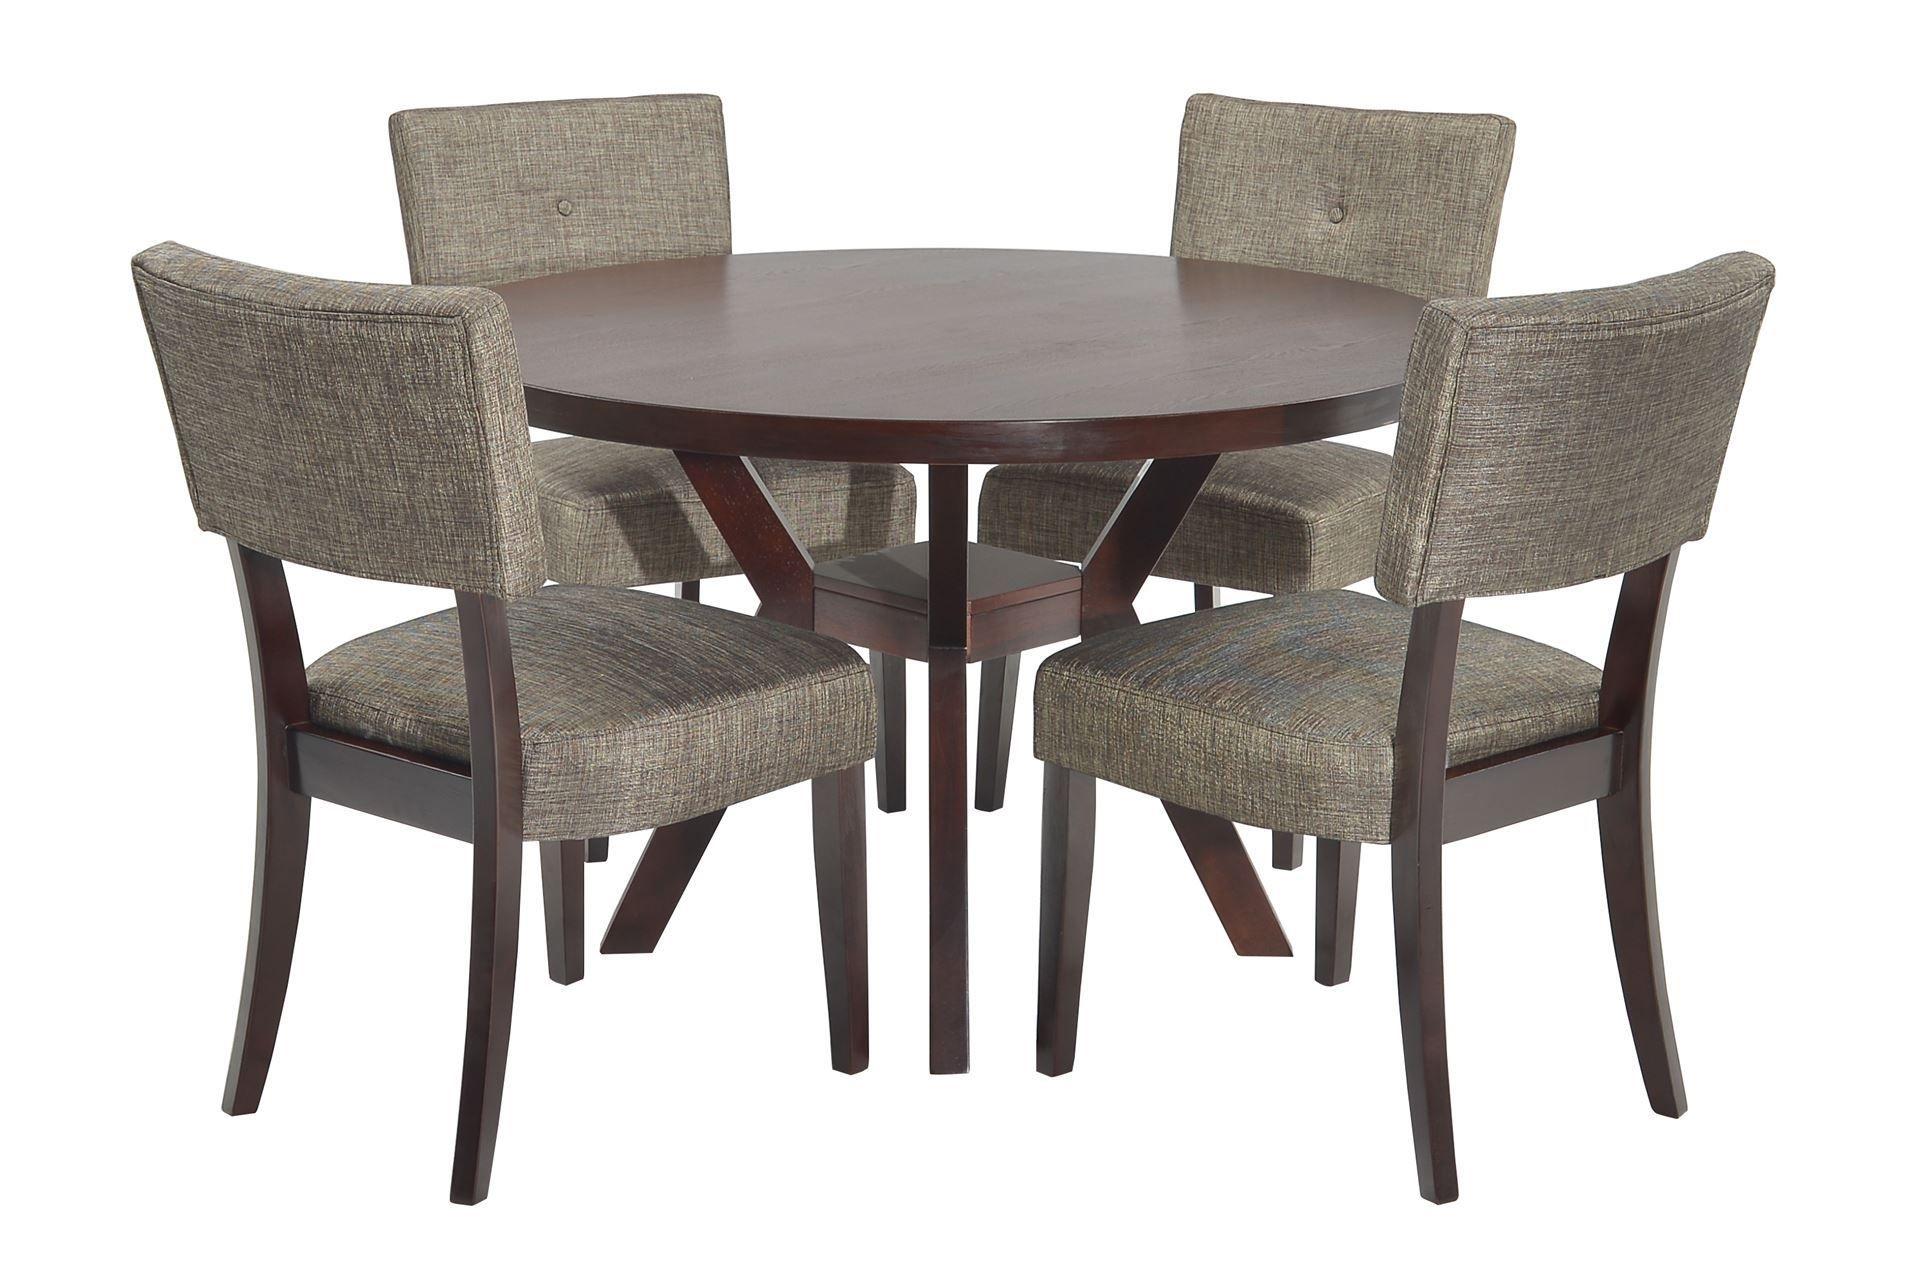 Macie 5 Piece Round Dining Set, Brown | Round Dining Set, Round Inside Best And Newest Macie Round Dining Tables (Image 12 of 20)